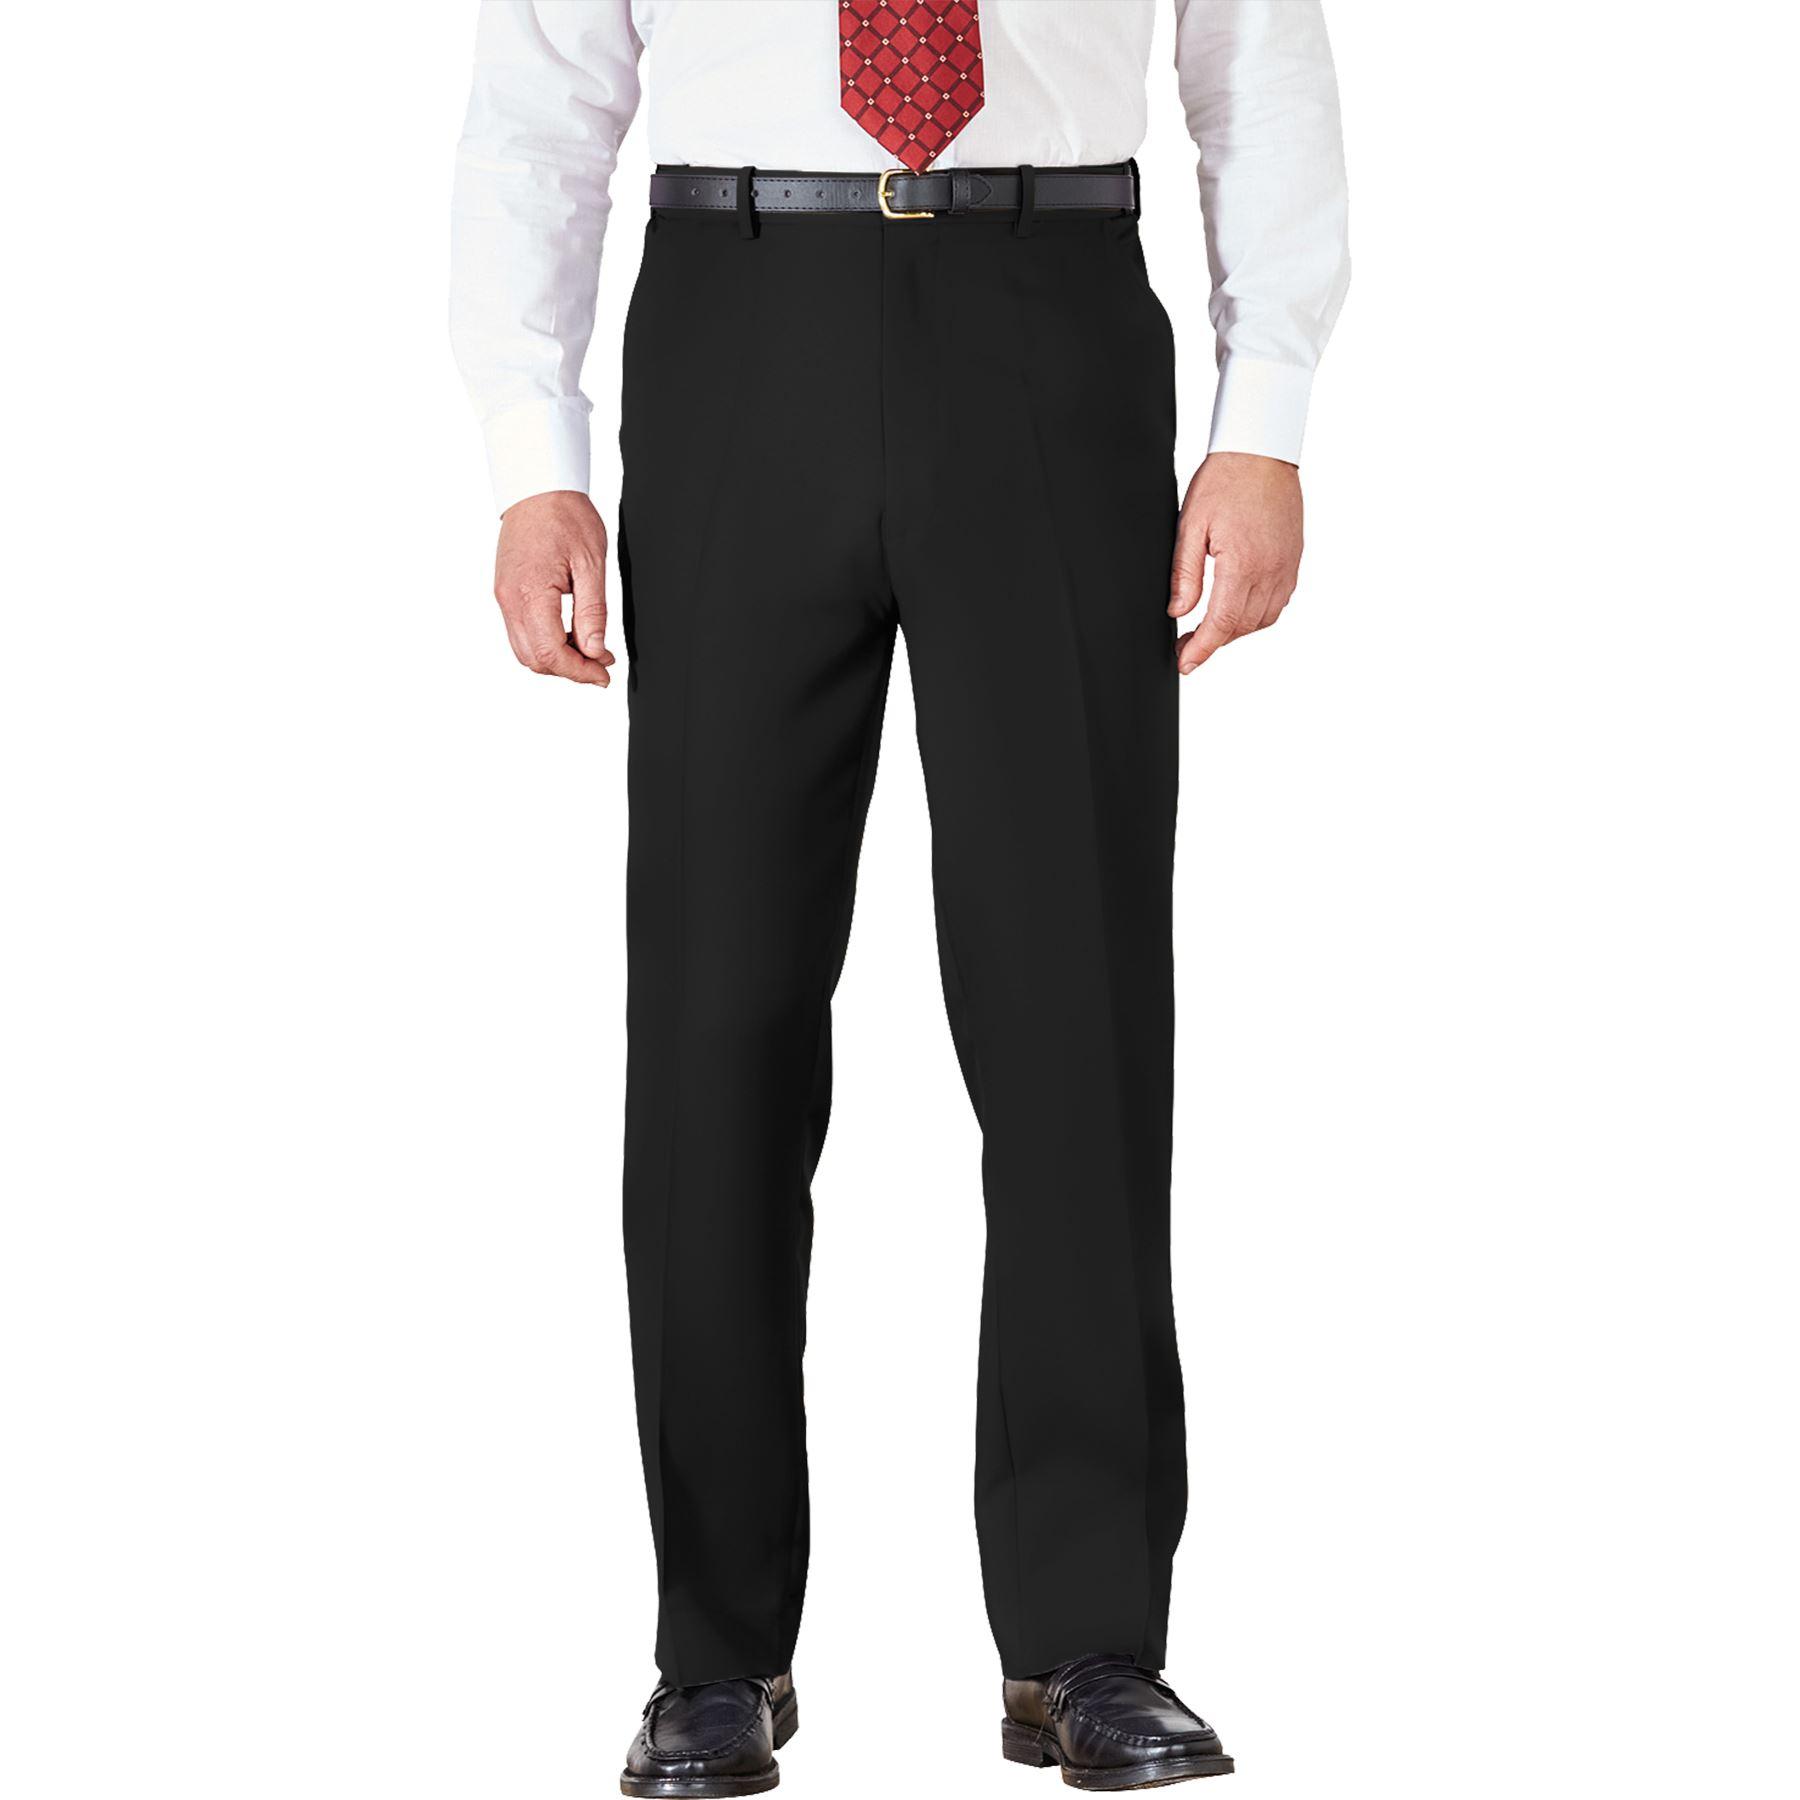 Para-Hombres-Pantalones-Regular-Fit-Straight-Chino-De-Algodon-Informales-Pantalones-de-trabajo miniatura 2